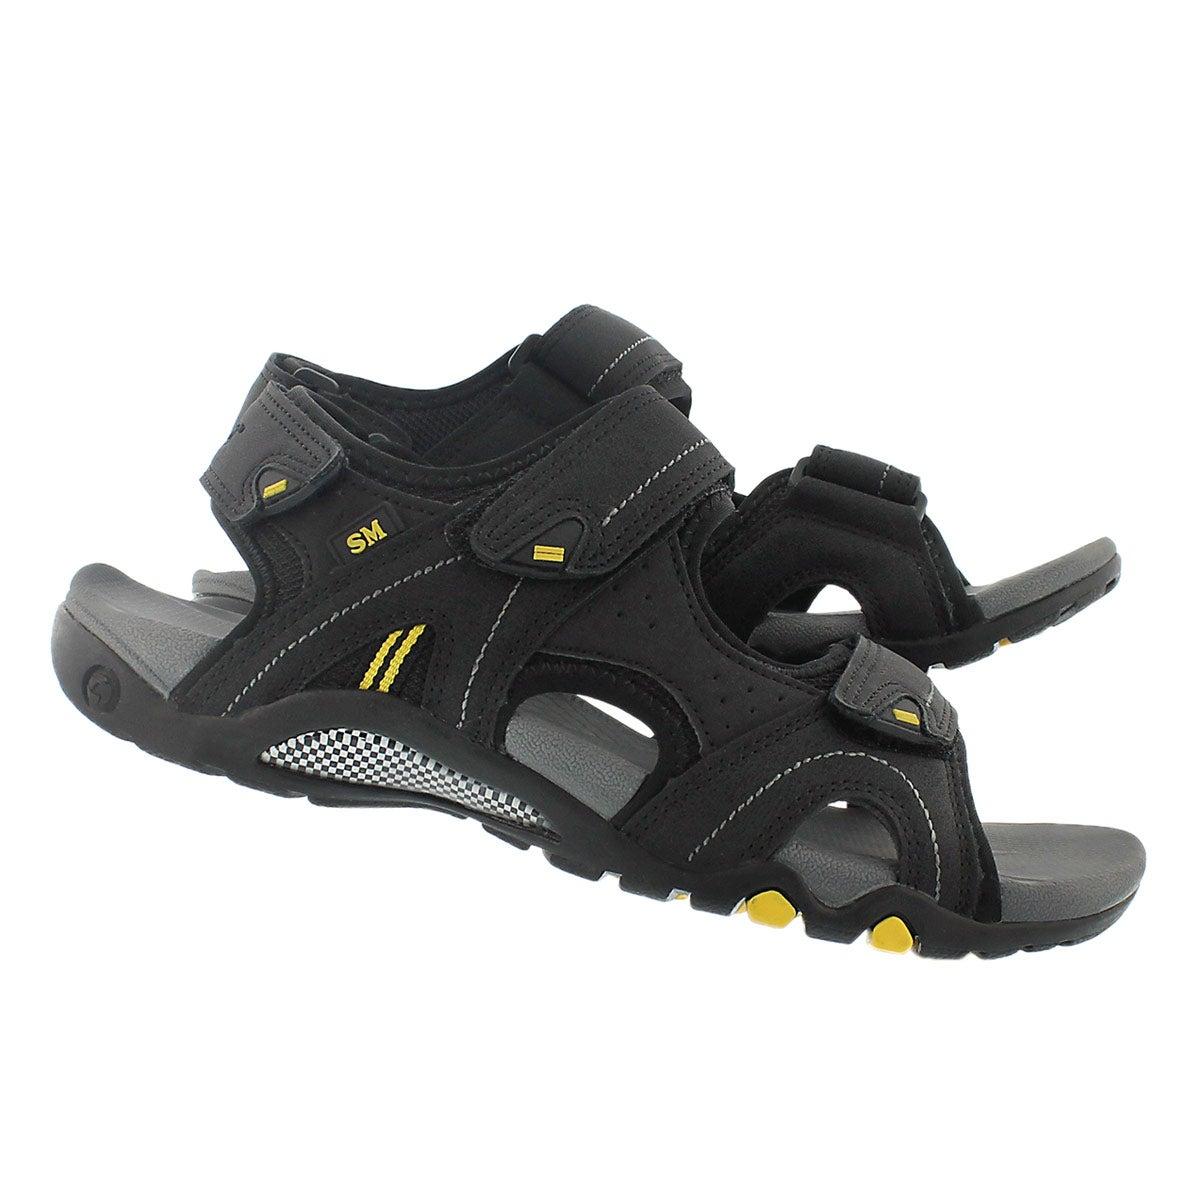 Mns Keegan black 3 strap sport sandal